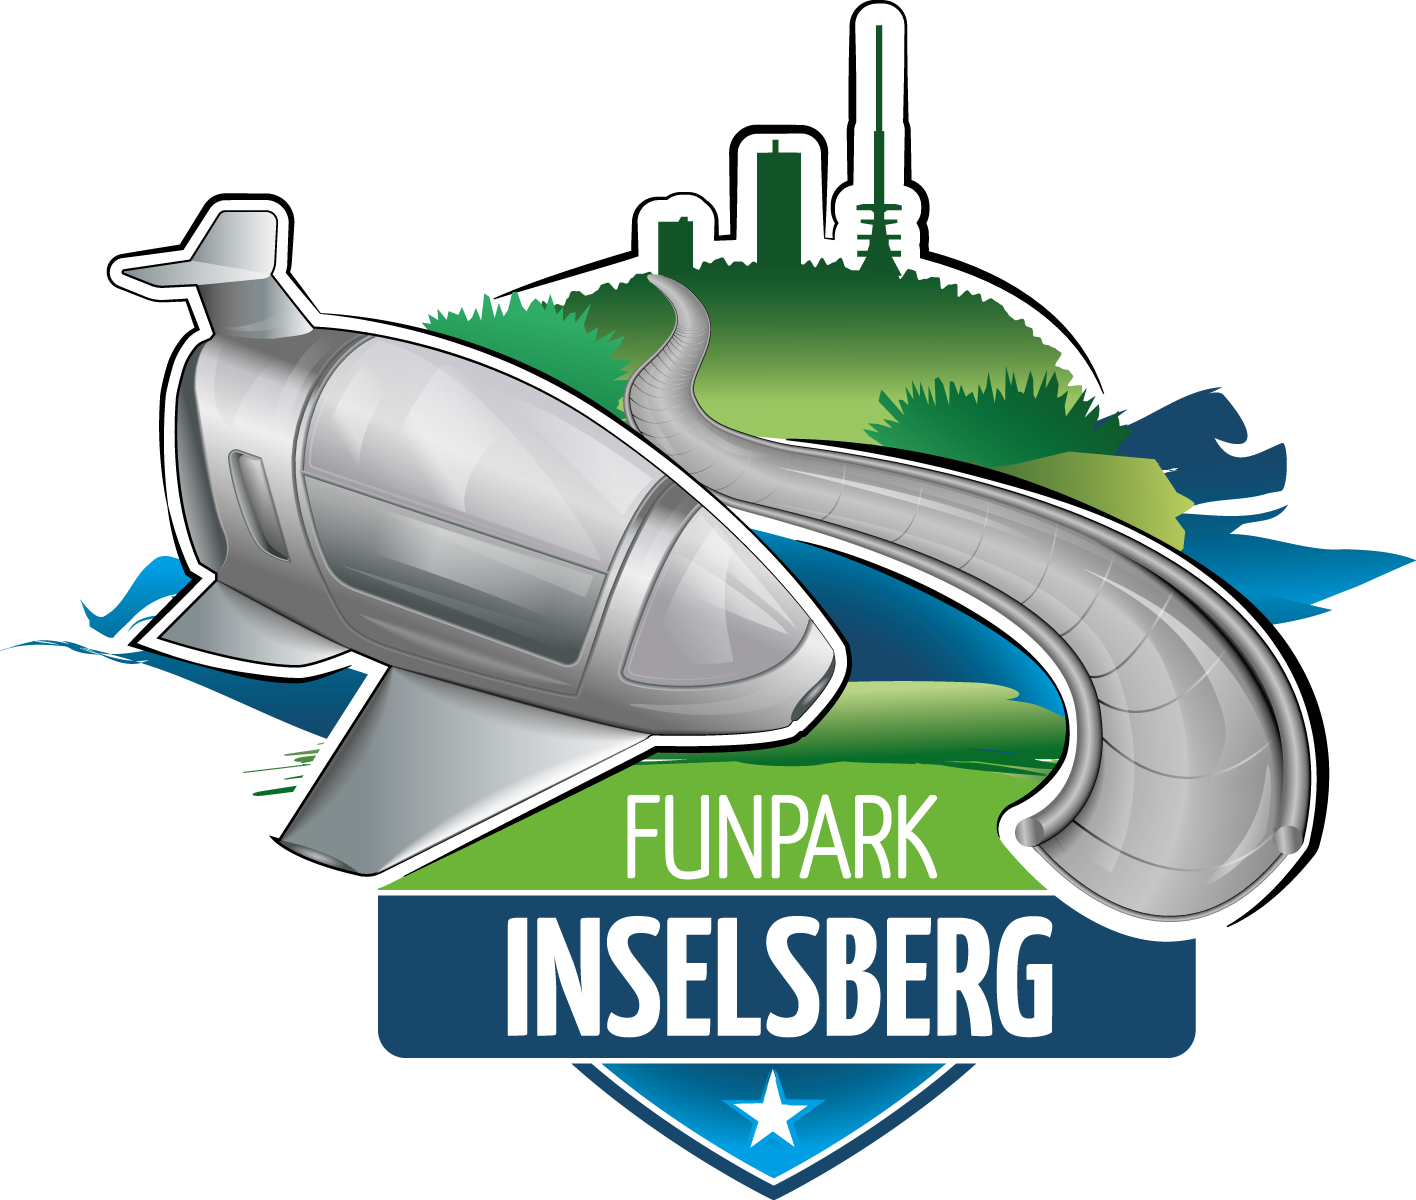 Logo Inselsberg Funpark